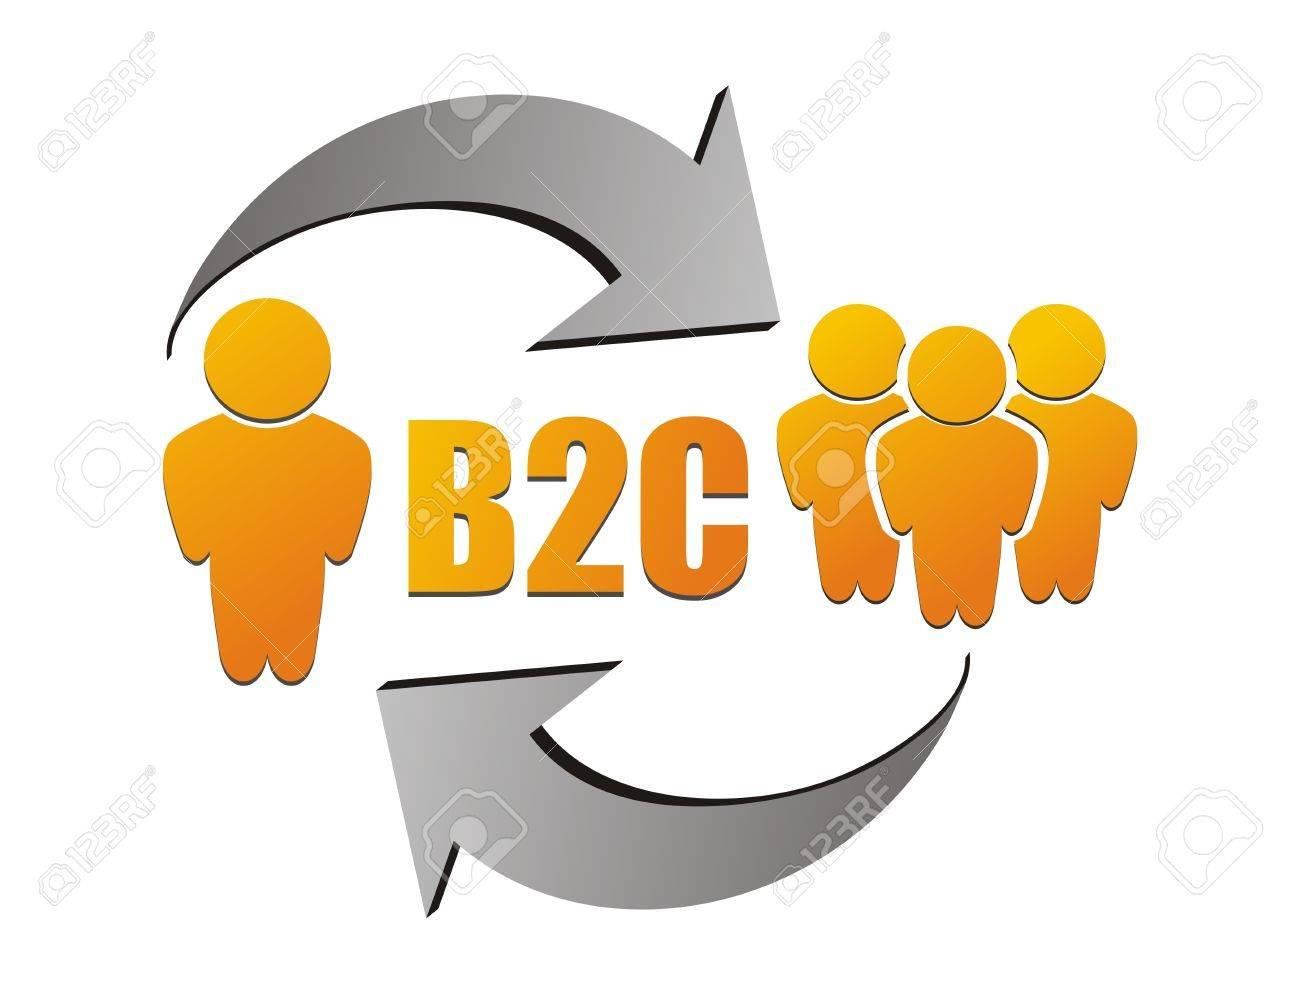 Business to customer , B2C illustration Stock Vector - 19558721